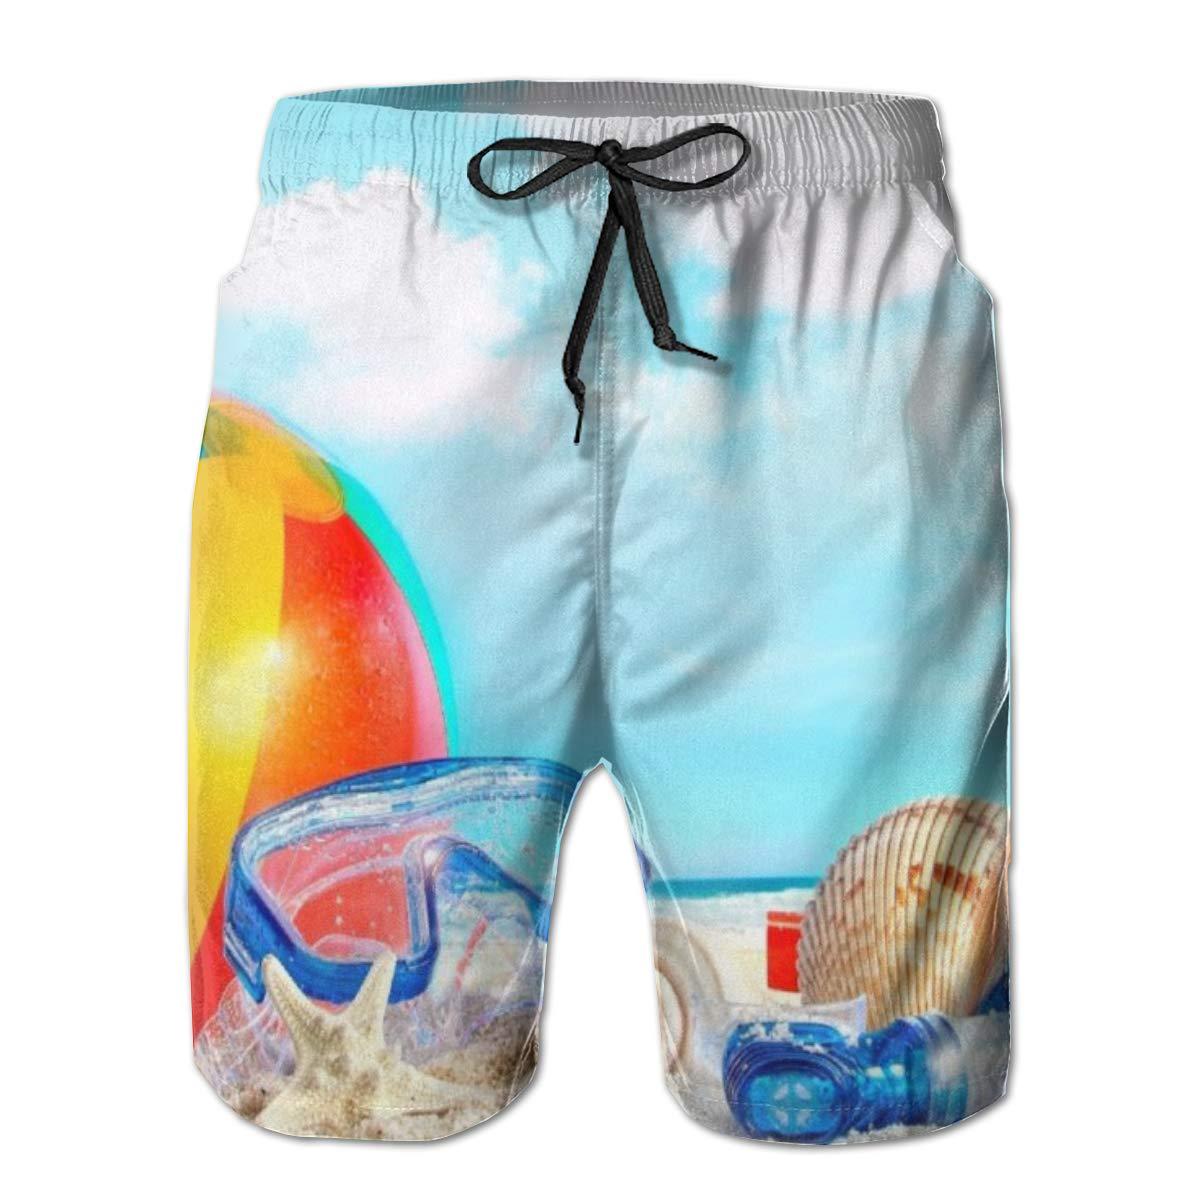 WMDJEG Tropical Hawaiian Beach Mens Summer Beachwear Sports Running Swim Board Shorts Mesh Lining